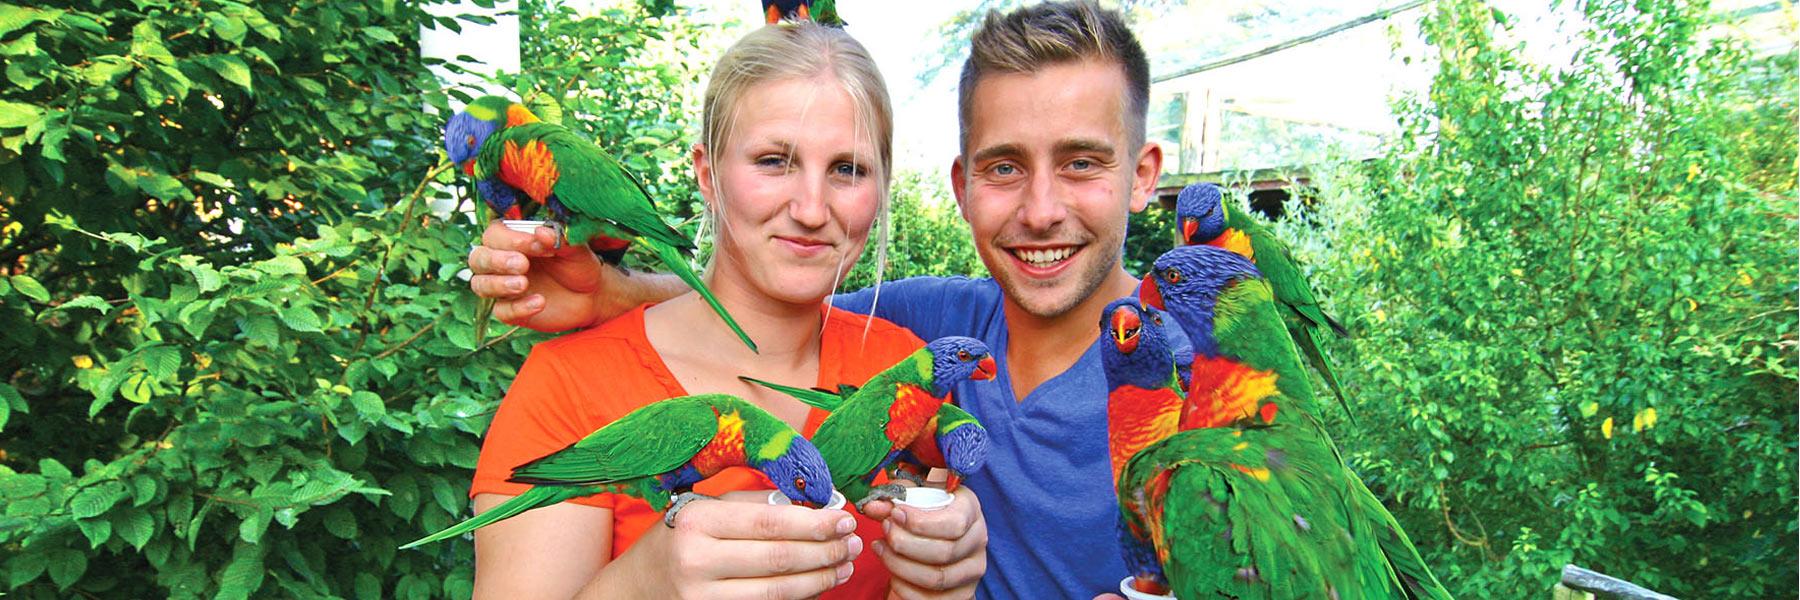 Team - Vogelpark Marlow gGmbH